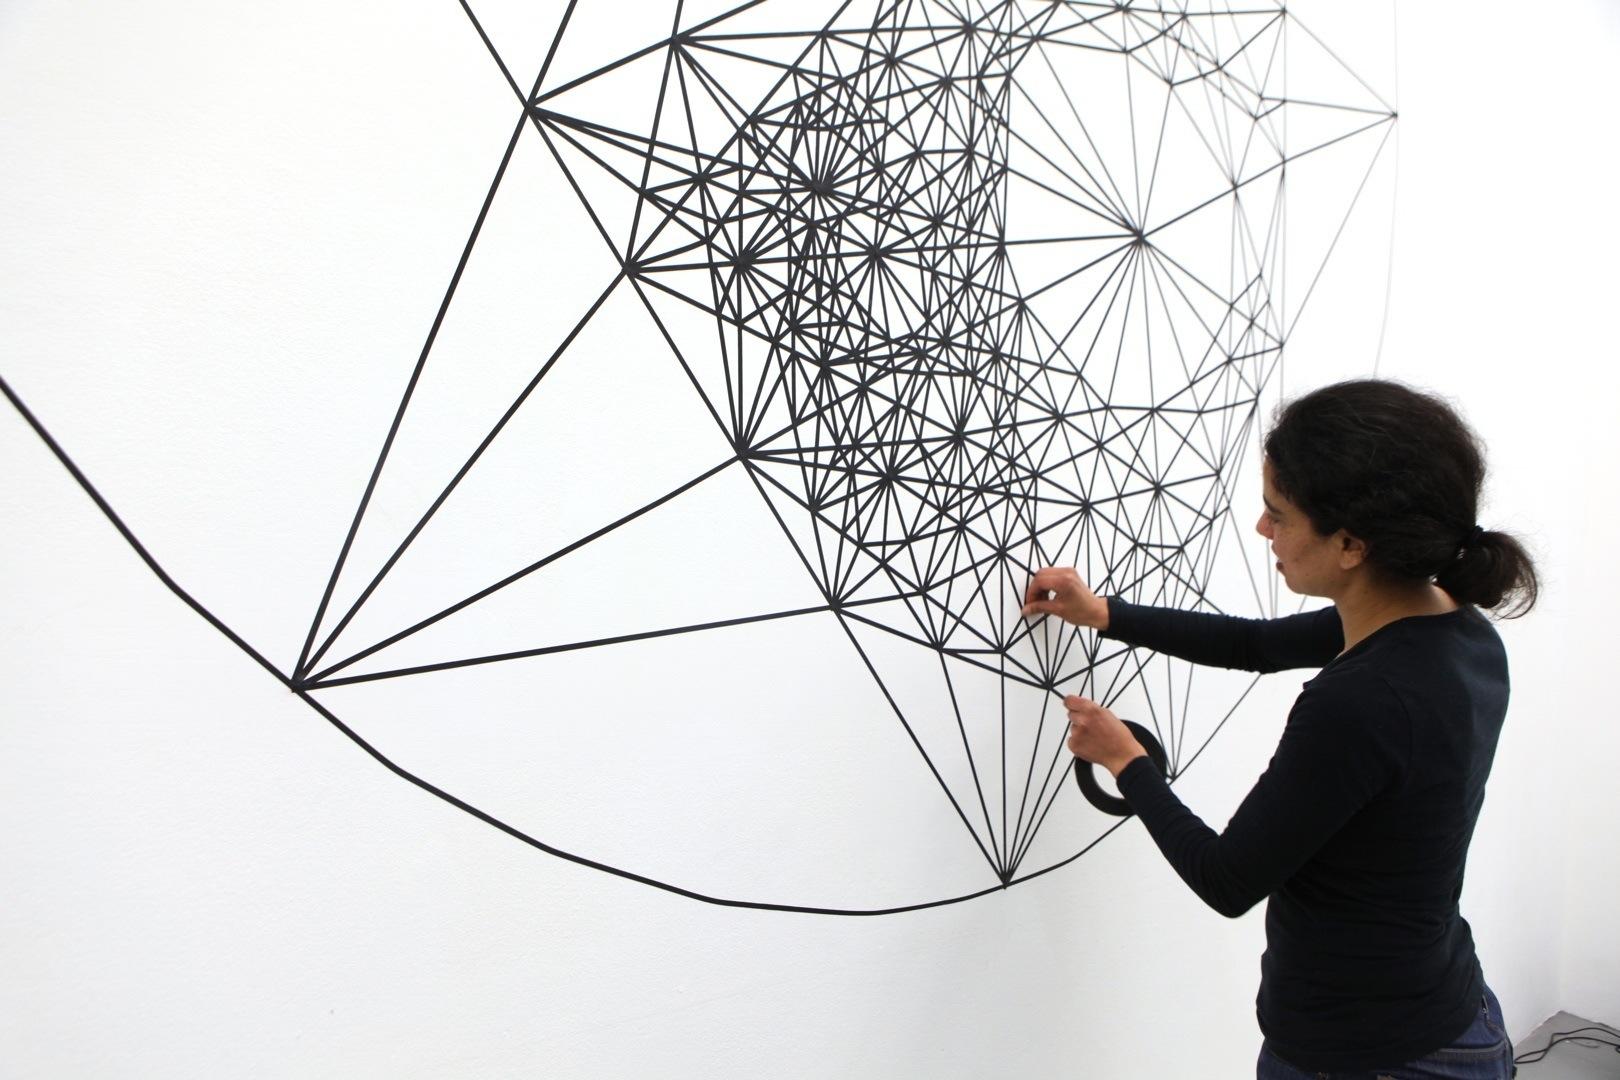 constellation, 2013, tape on wall, 400 x 300 cm, Espace YGREC, Paris